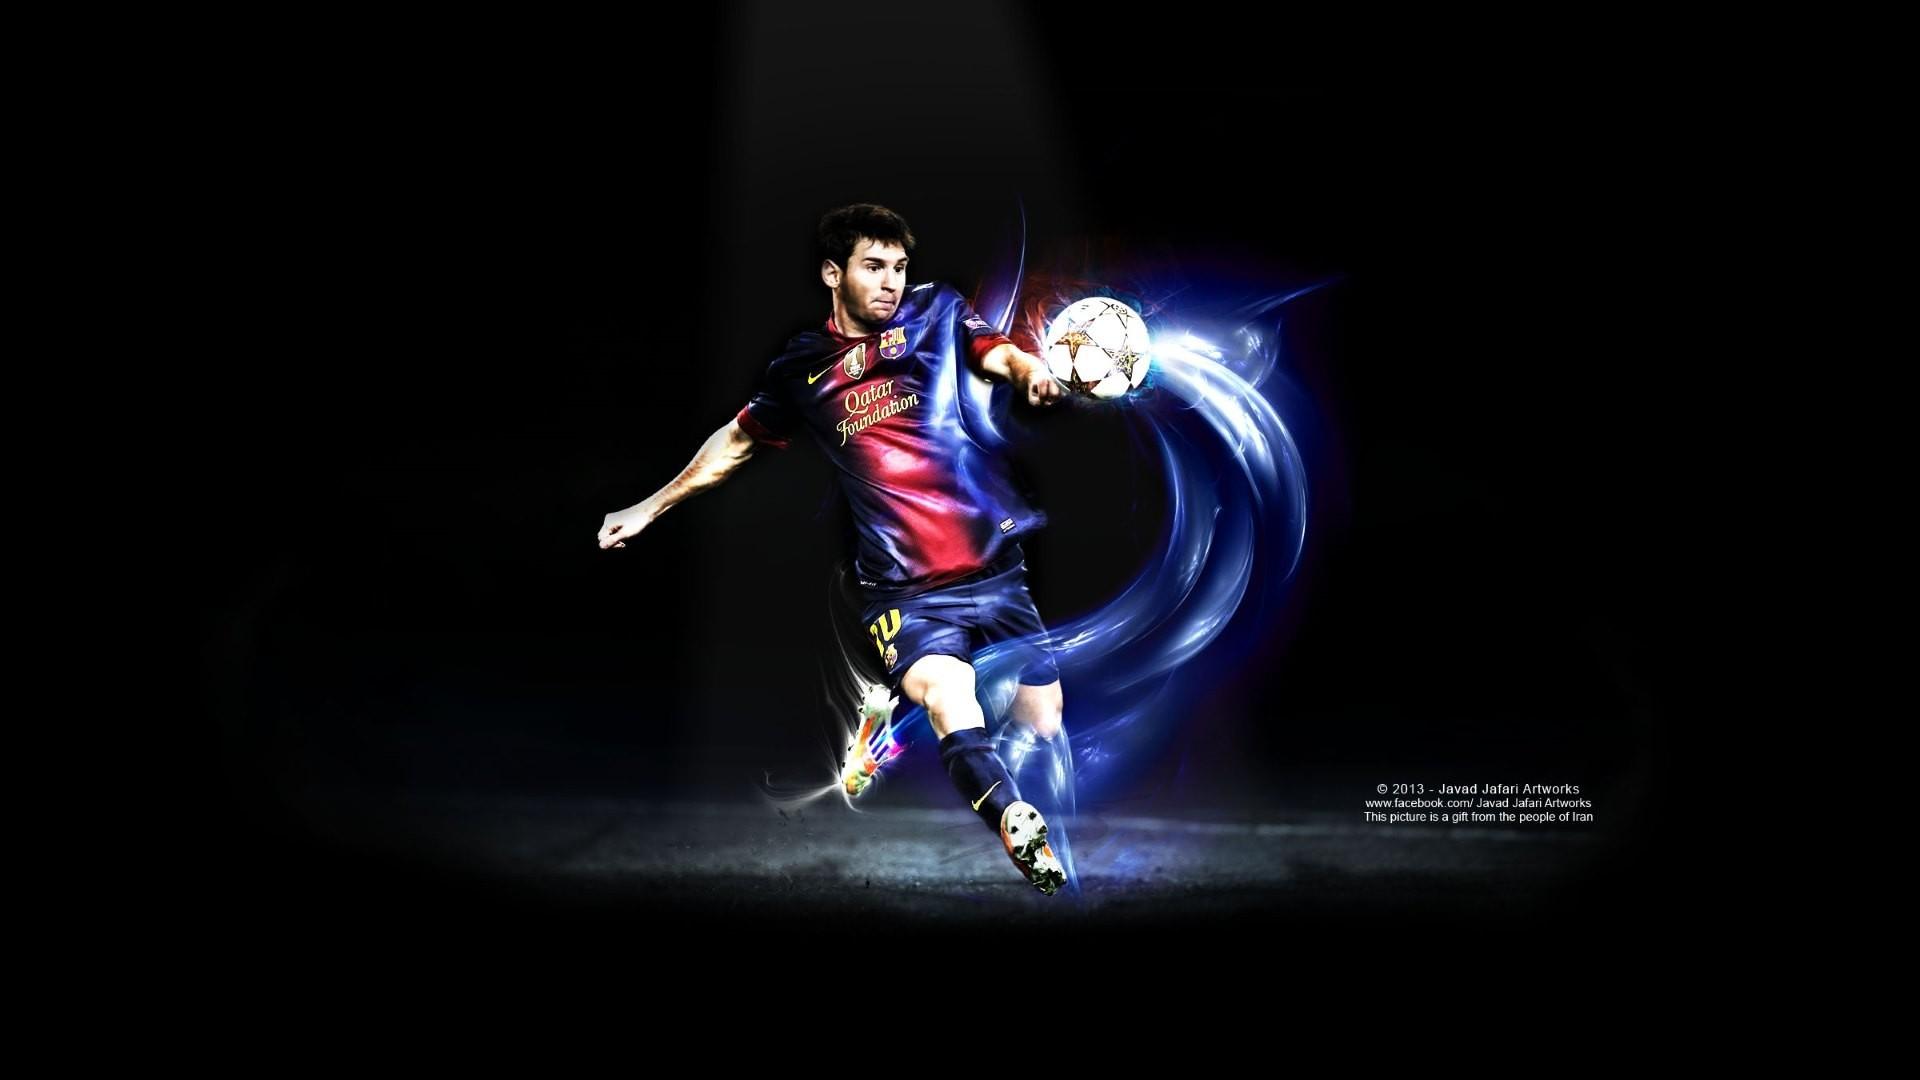 Best Lionel Messi Wallpaper Gif – FC Barcelona Wallpaper HD 2017 DJC4